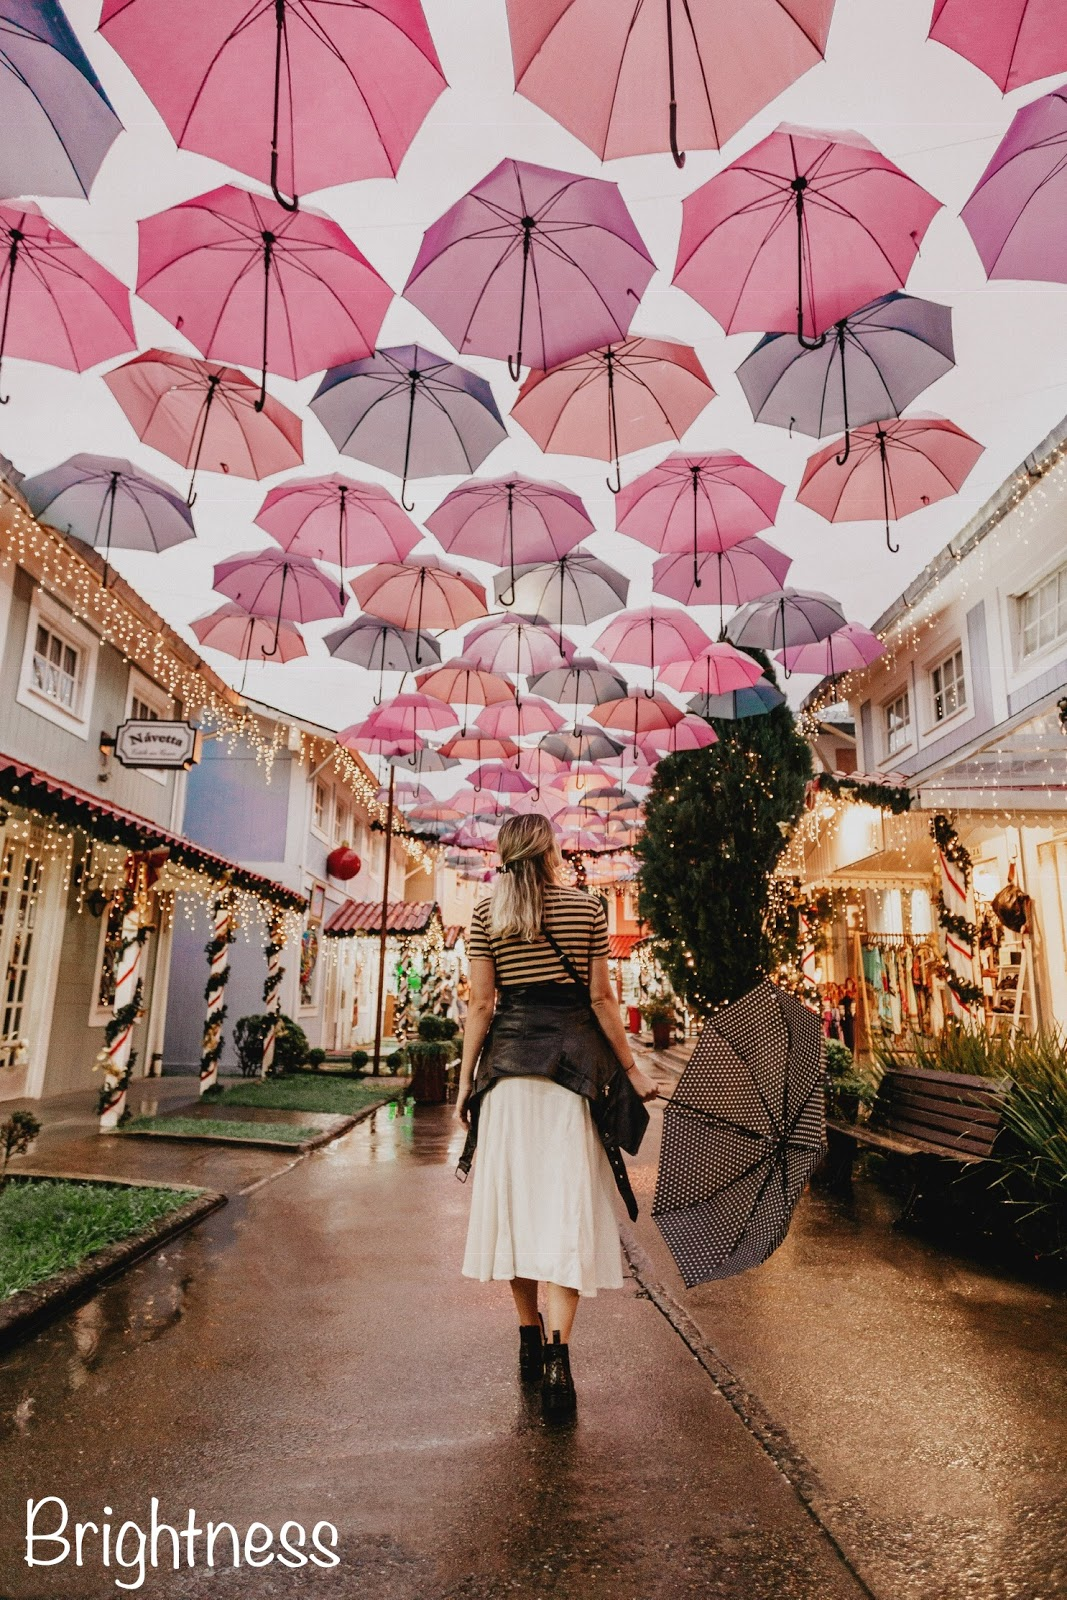 umbrella (brightness)